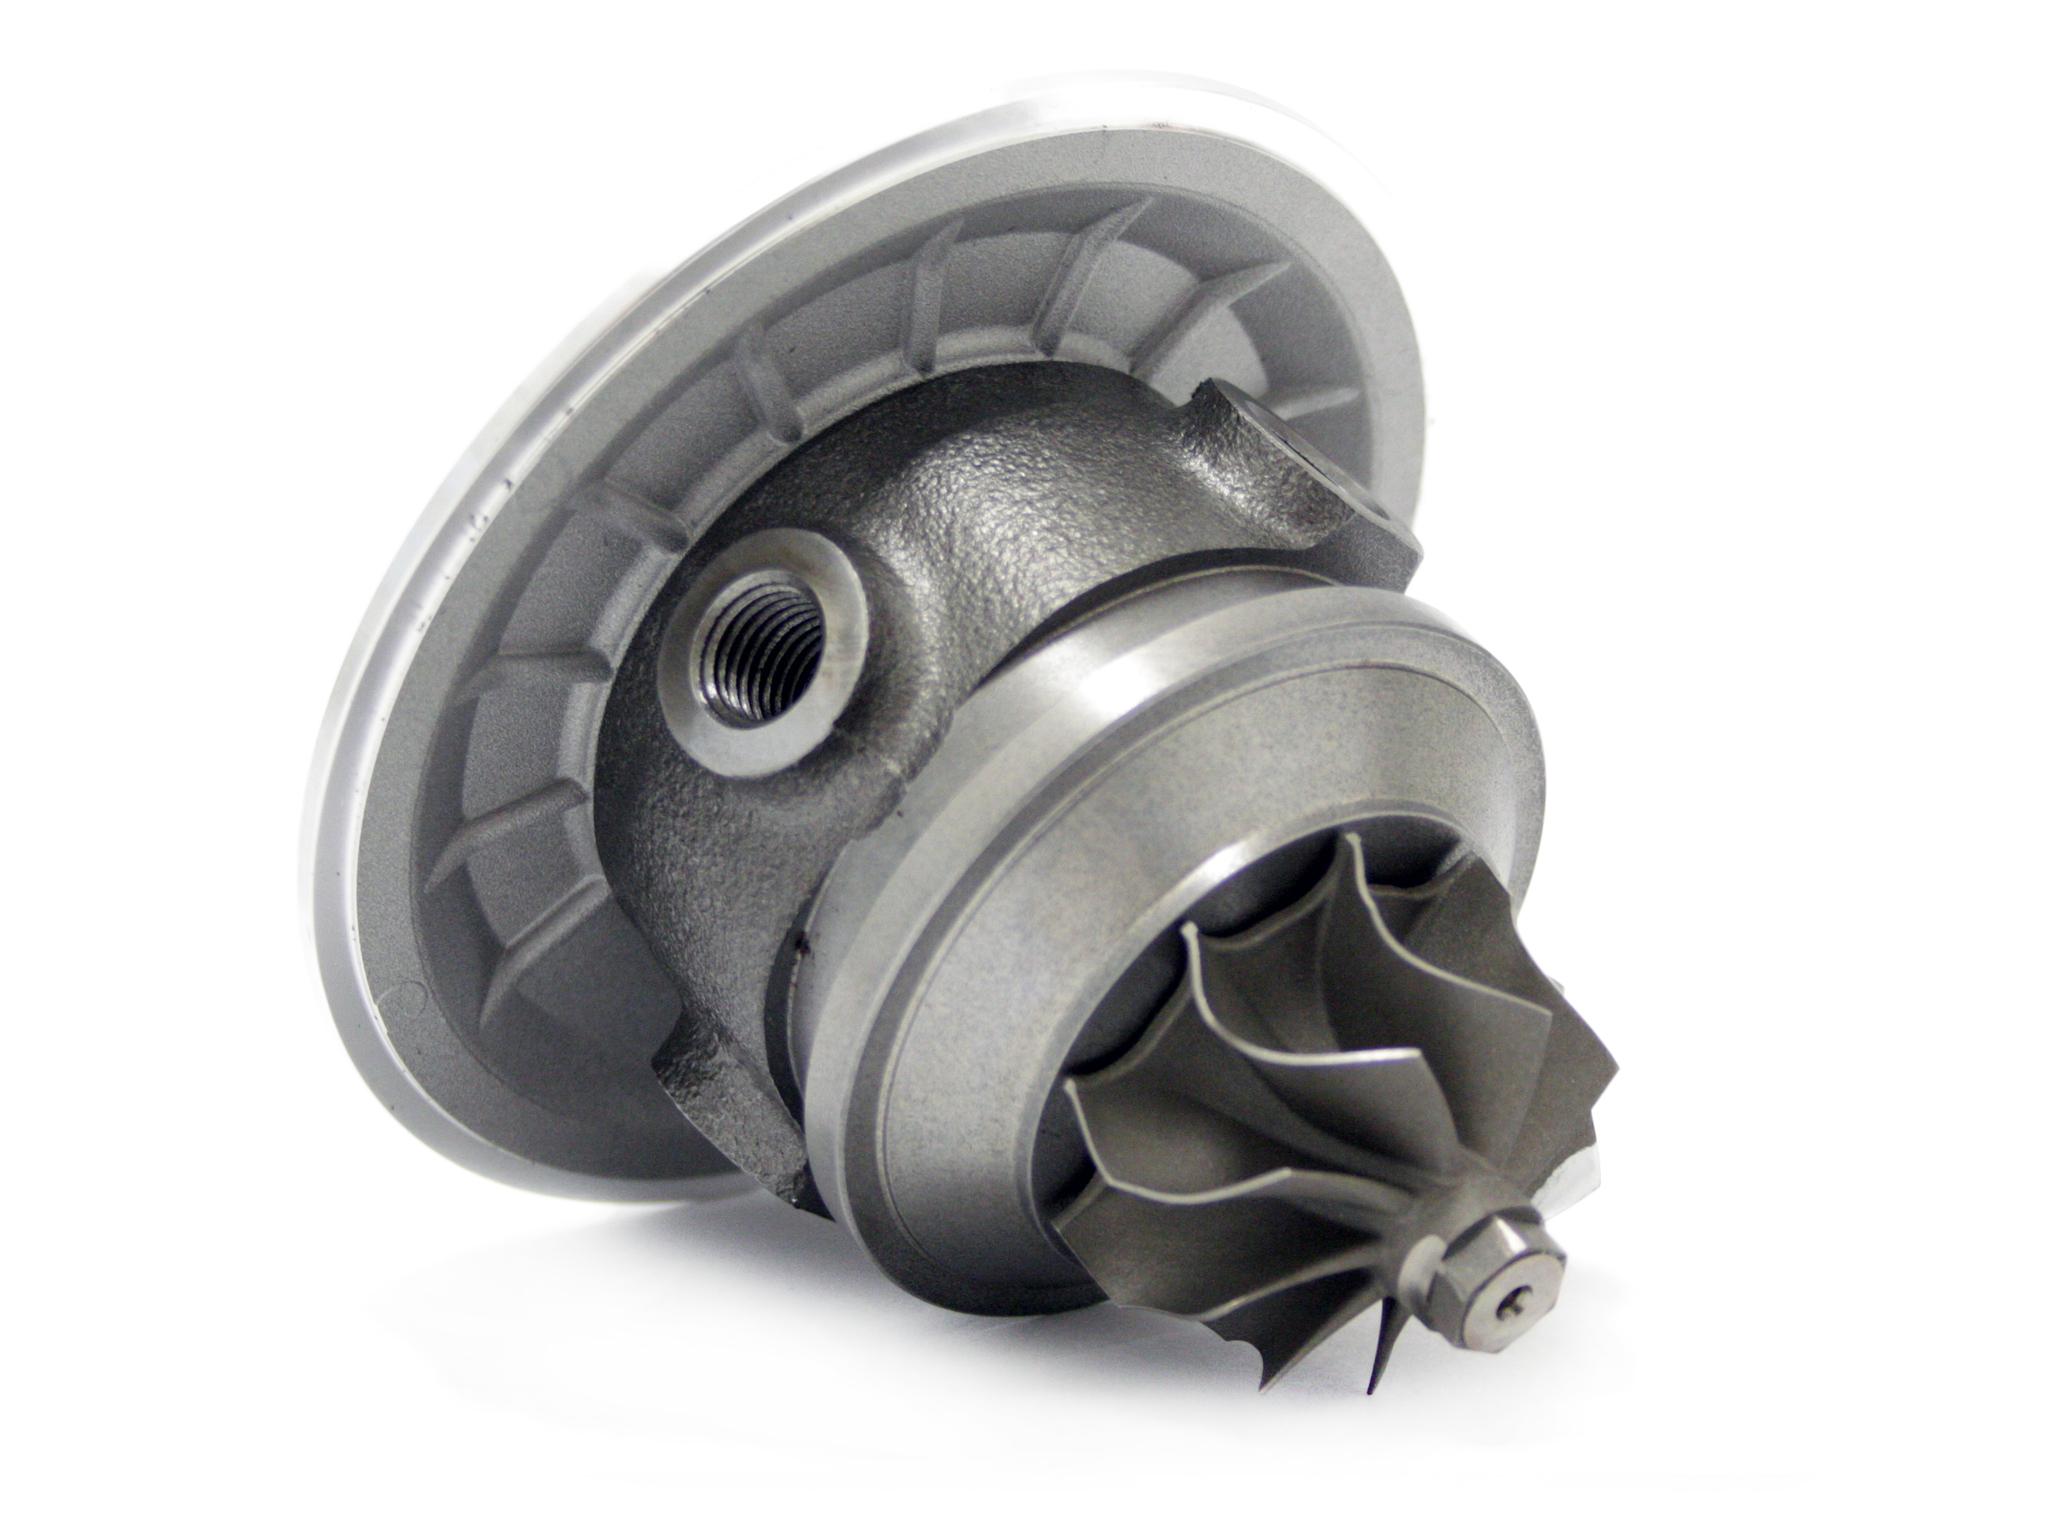 Картридж турбины GT1752S Сааб 2.0 - 3.0 150 - 230 л.с.